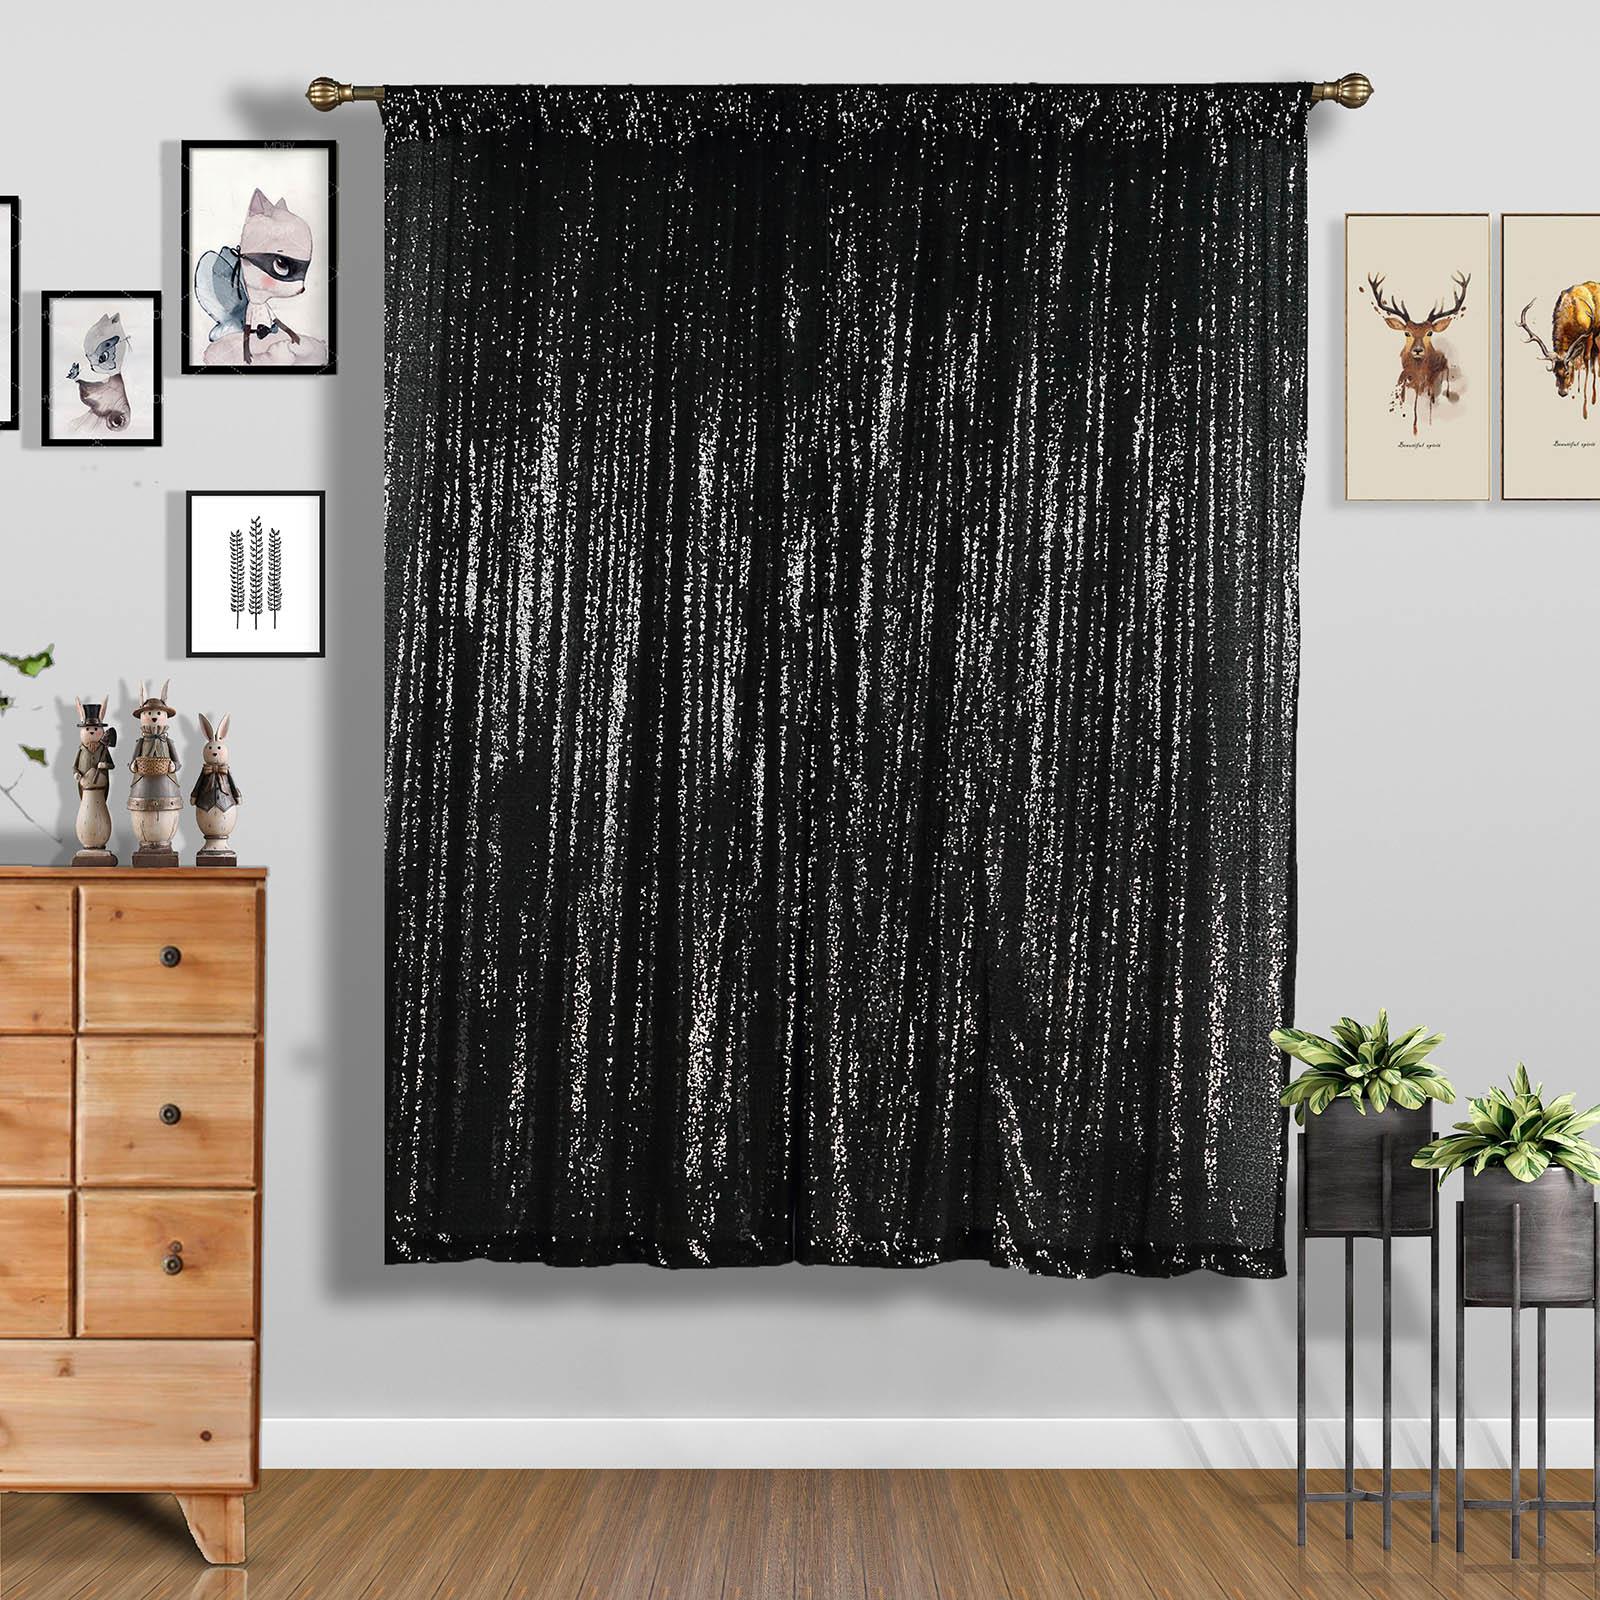 4-pcs-52-034-x-84-034-Sequined-Window-Curtains-Drapes-Panels-Backdrop-Home-Party-Decor thumbnail 5